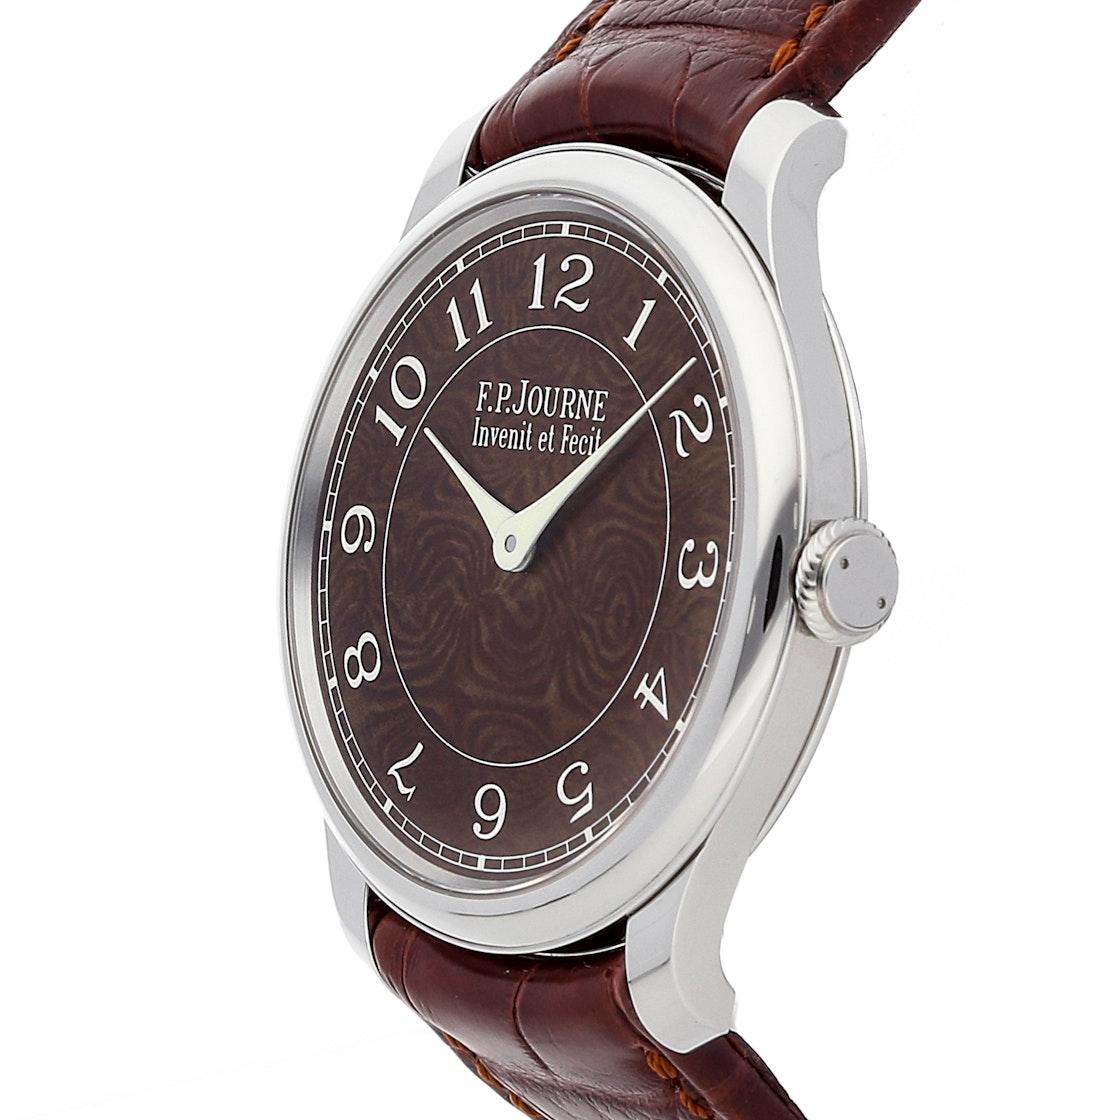 F.P. Journe Chronometre Holland & Holland